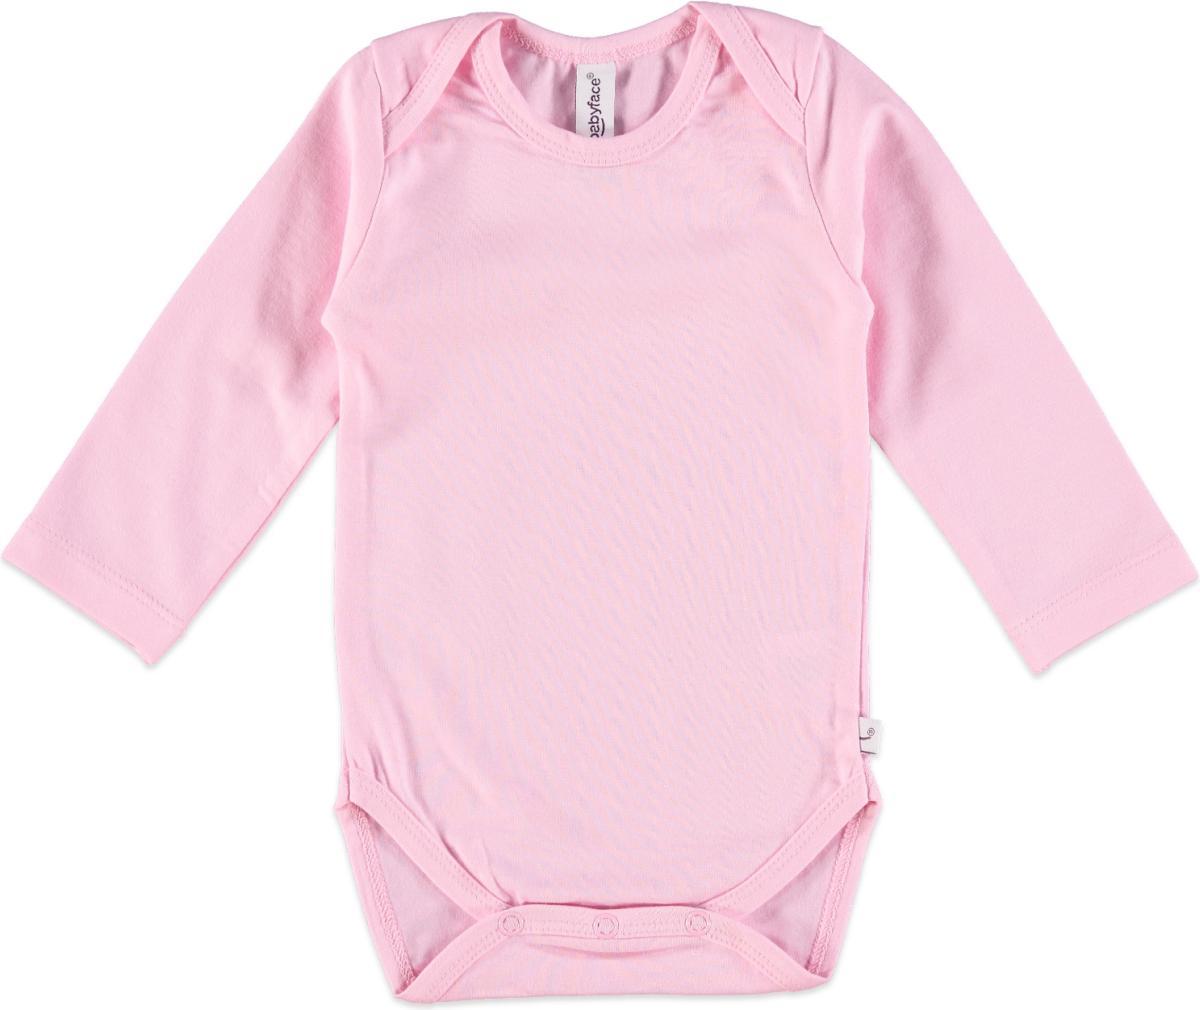 Babyface Unisexrompertje - Pink - Maat 50 / 56